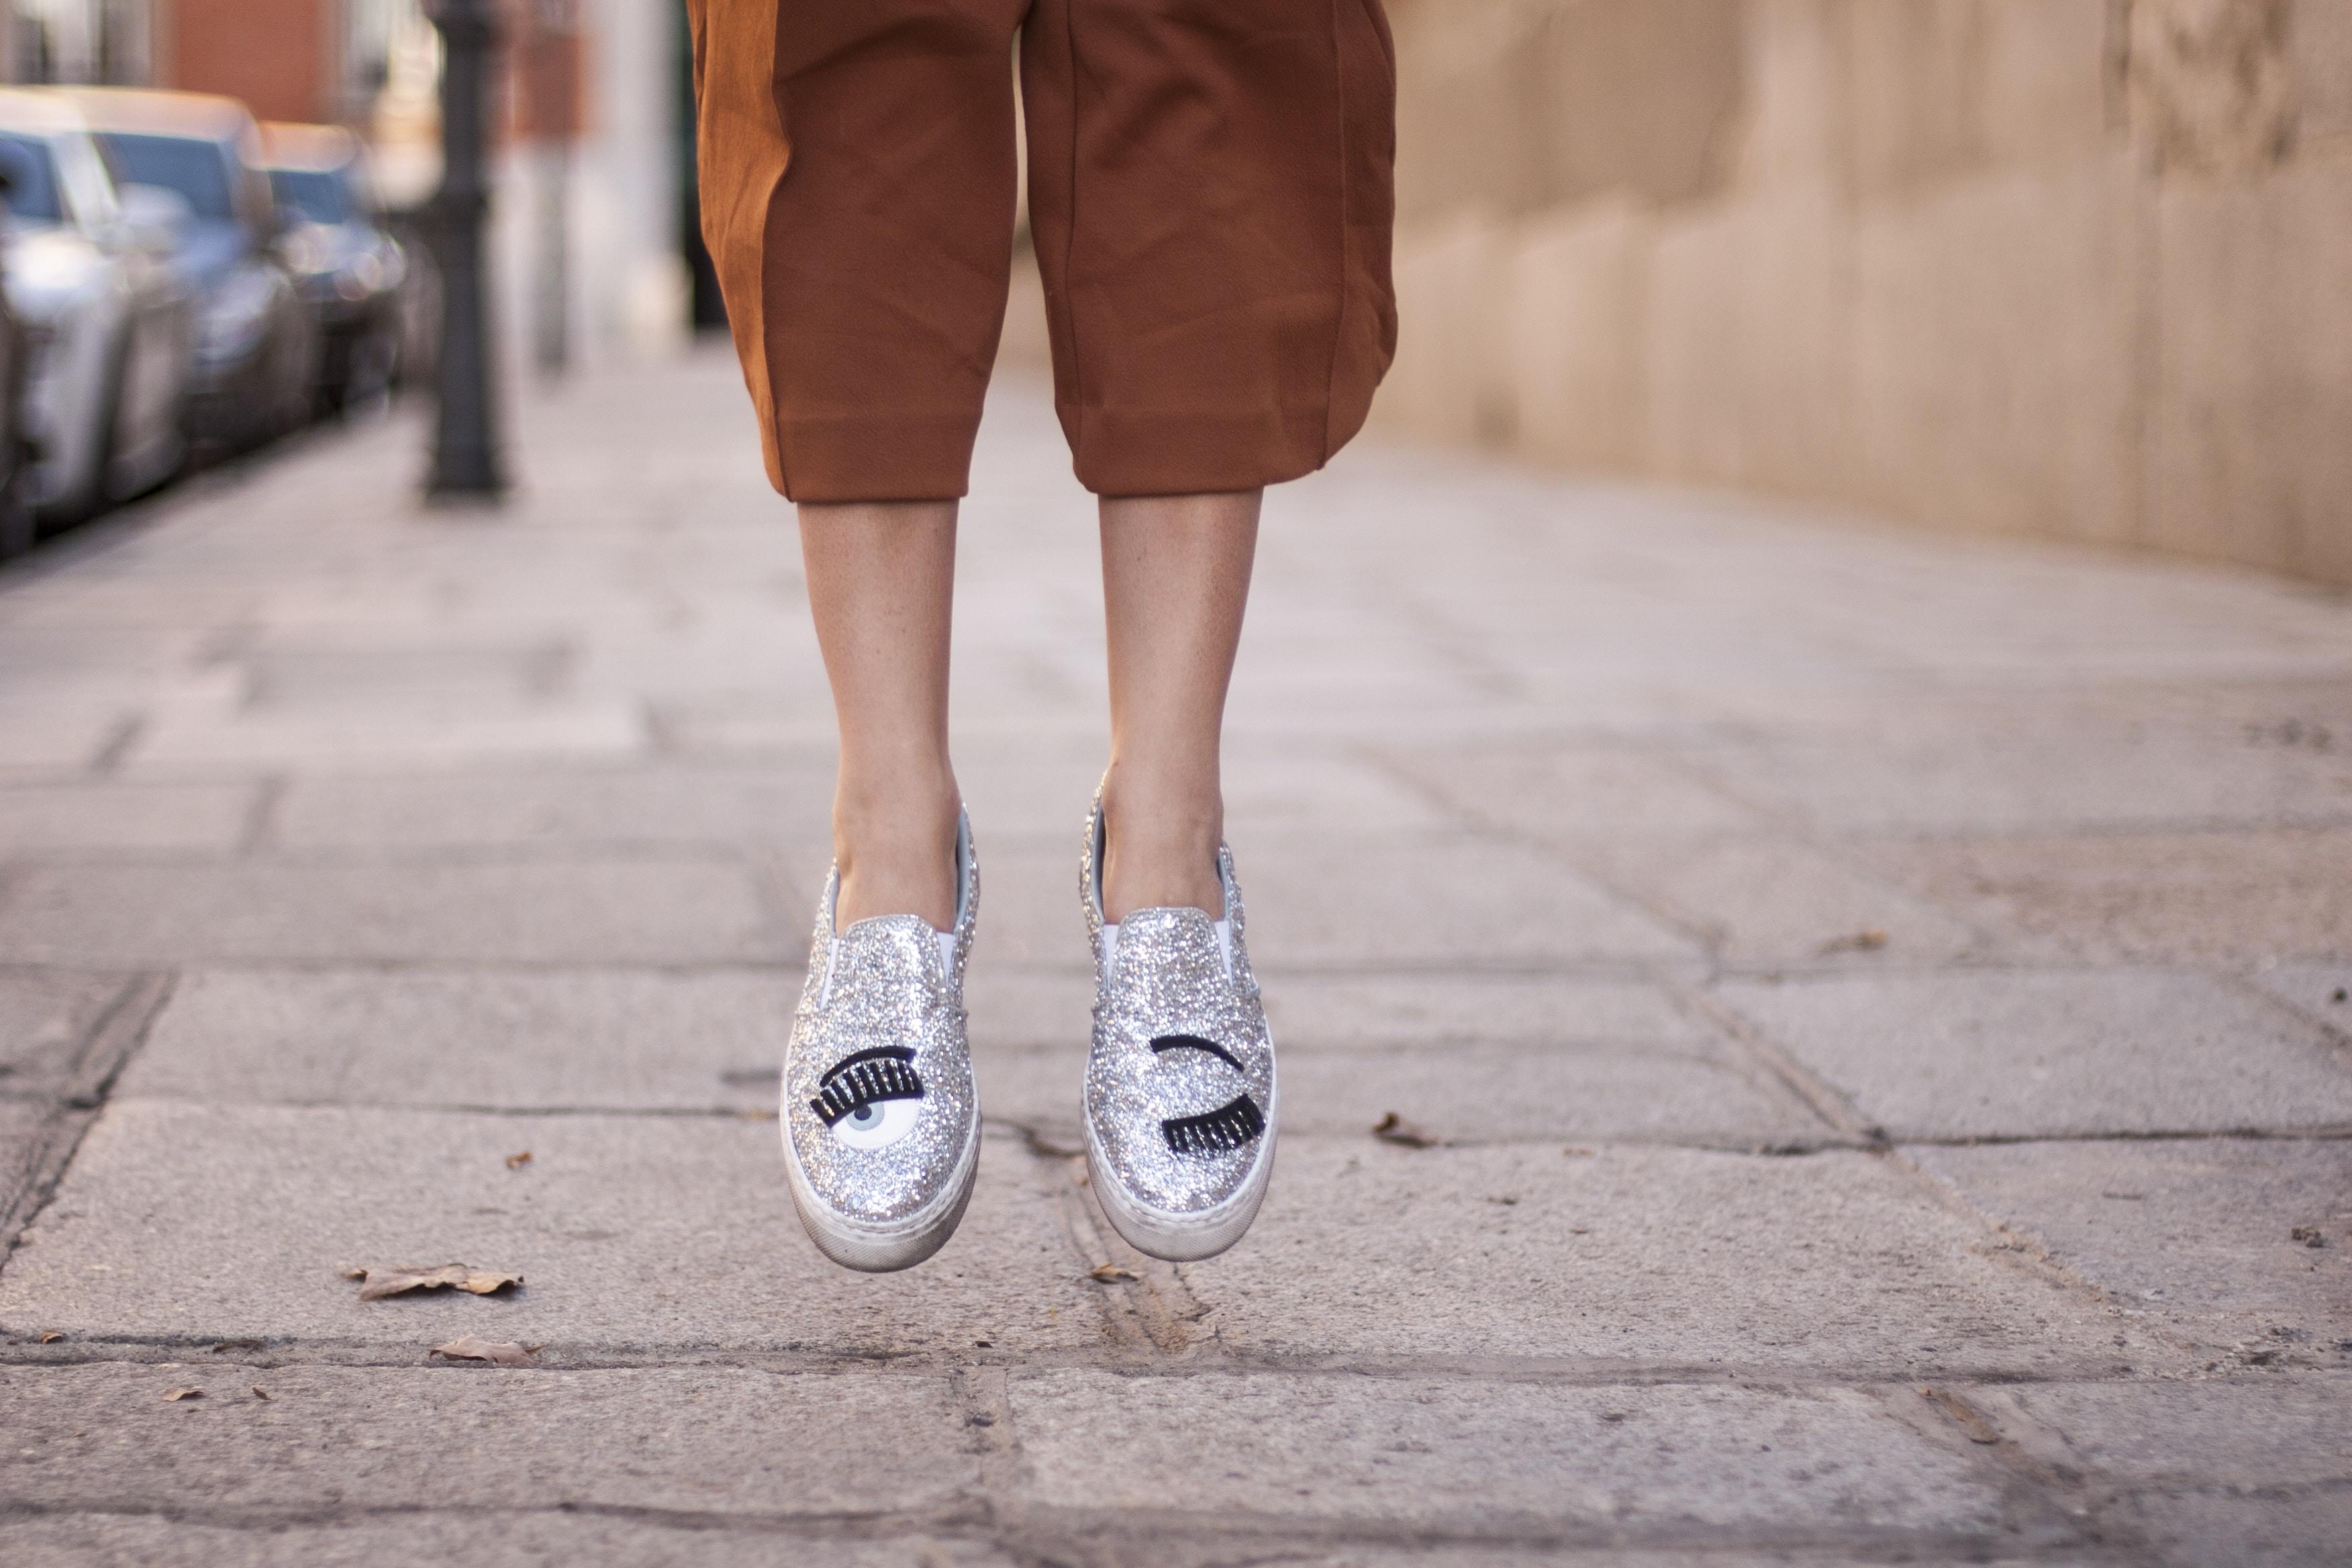 person jumping on sidewalk